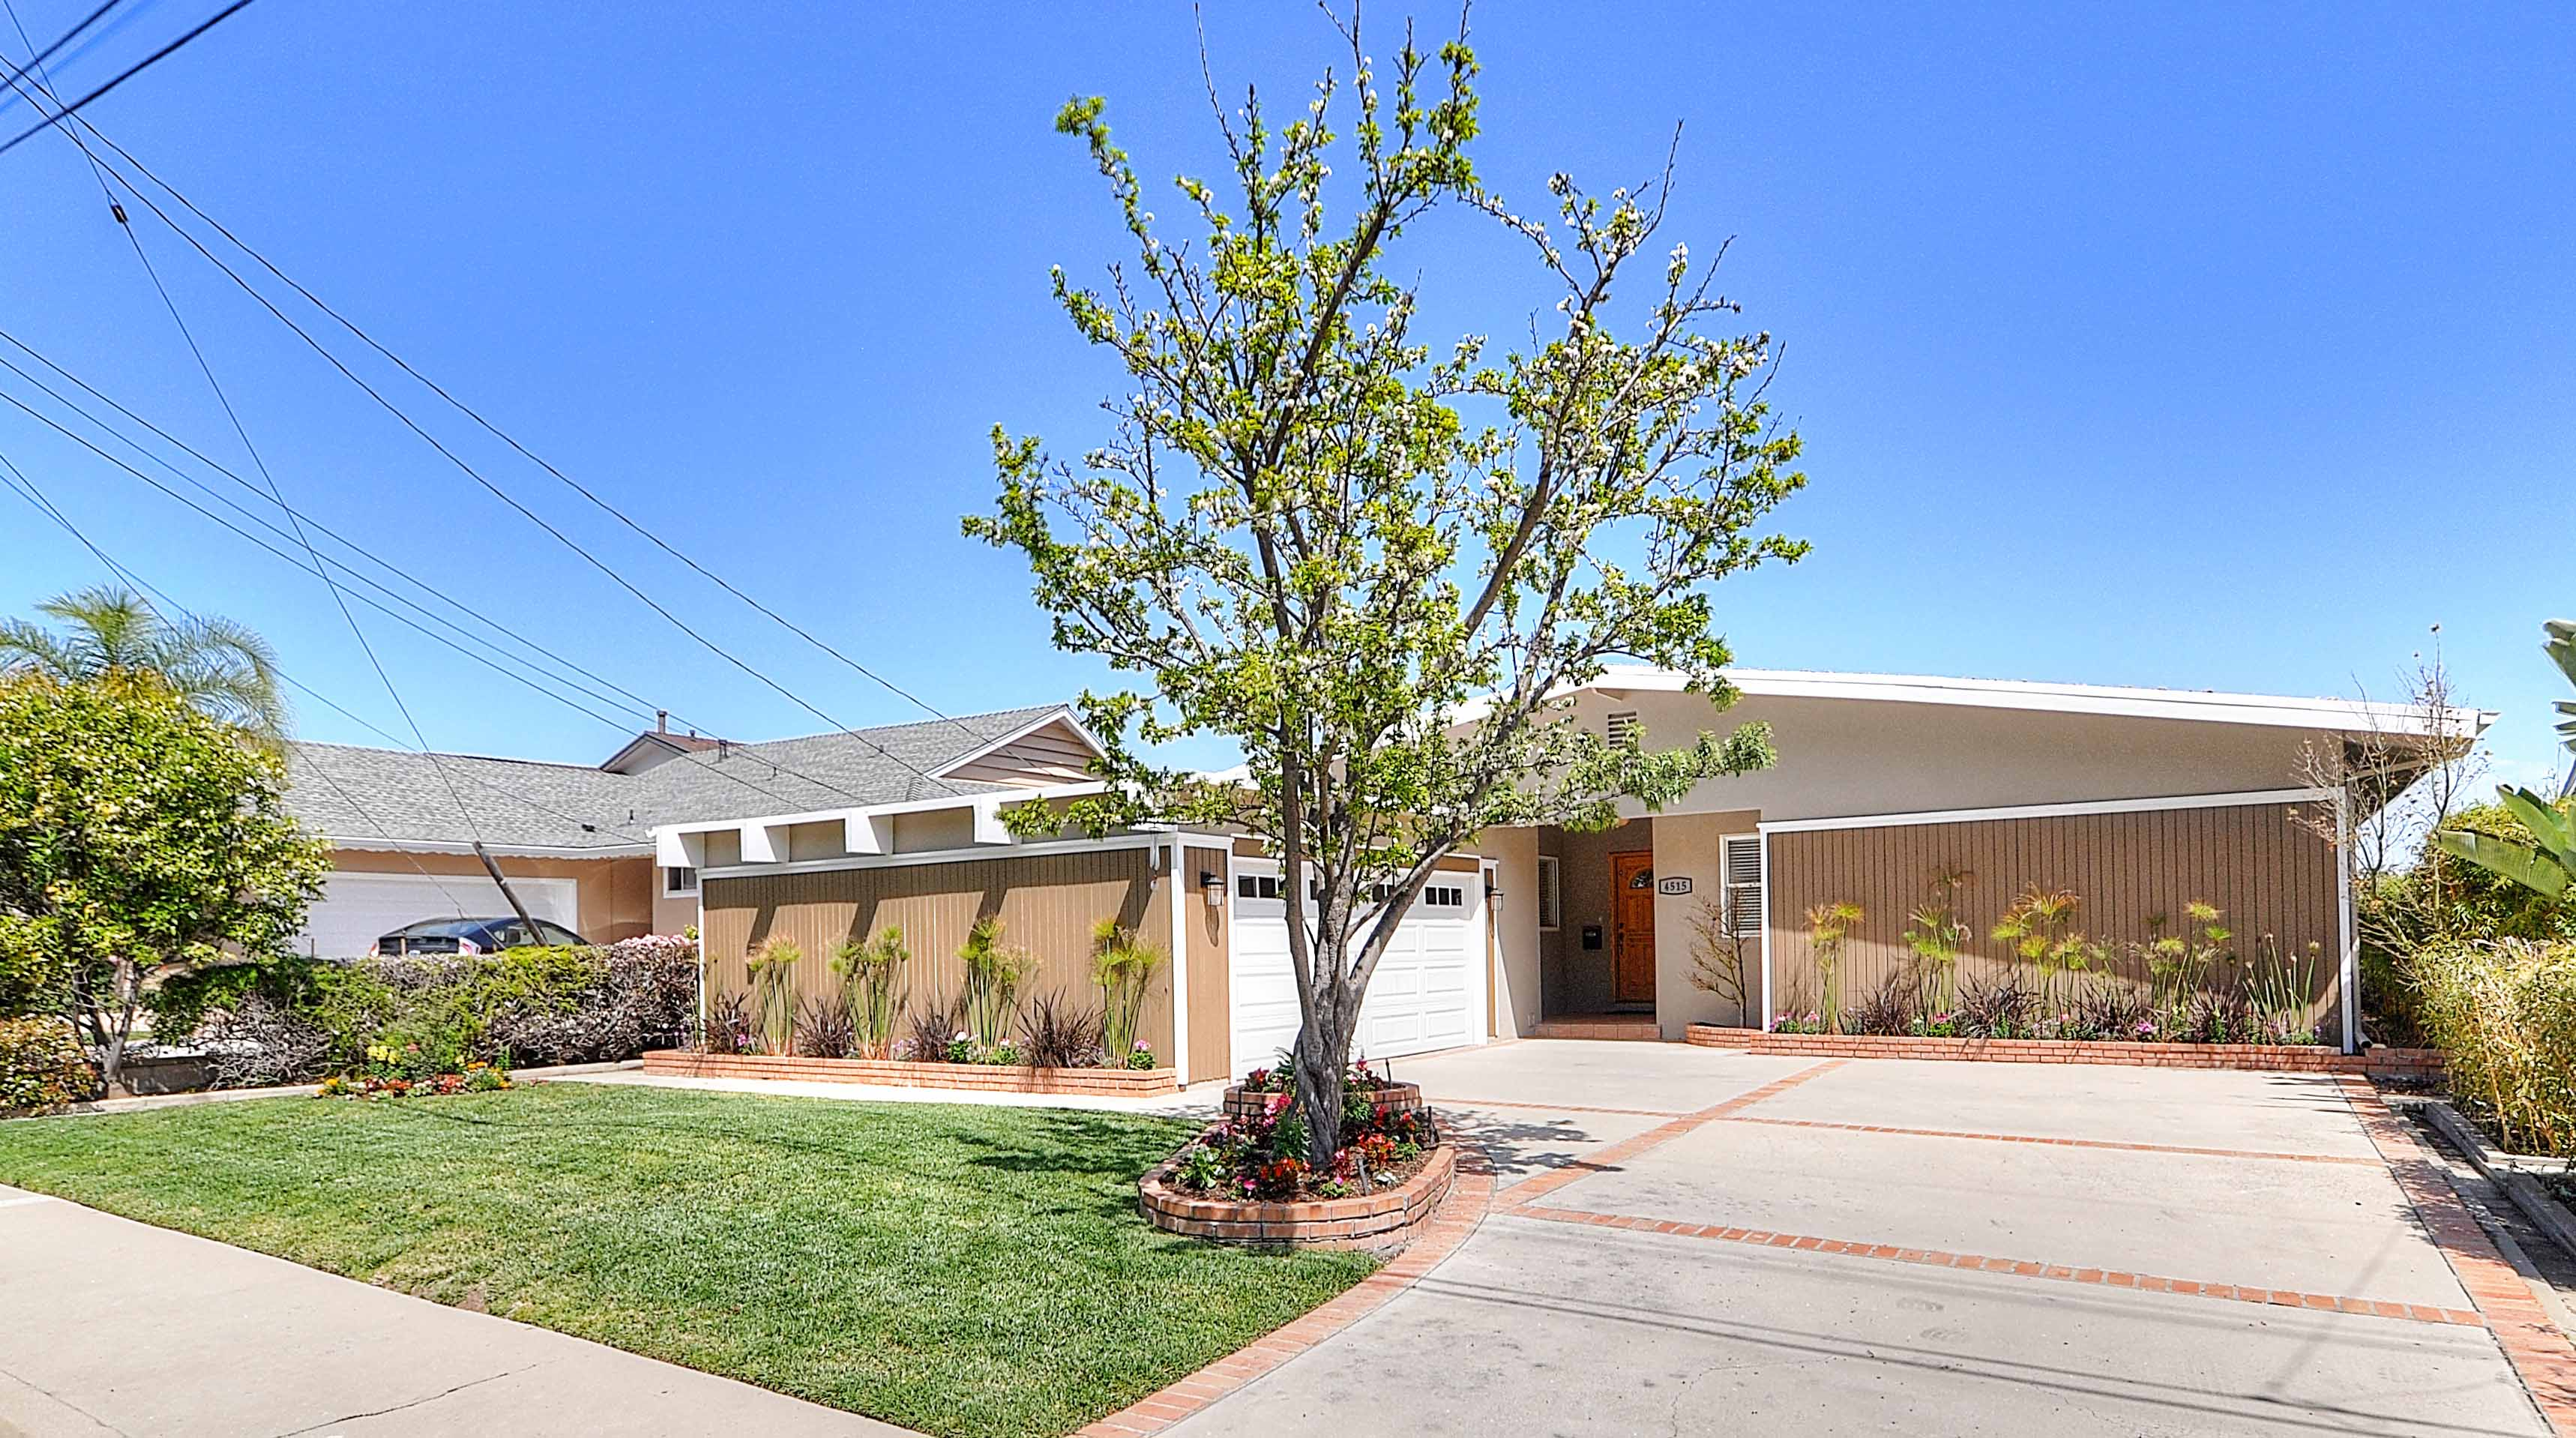 4515-Vista-Largo-front-of-house2-Copy